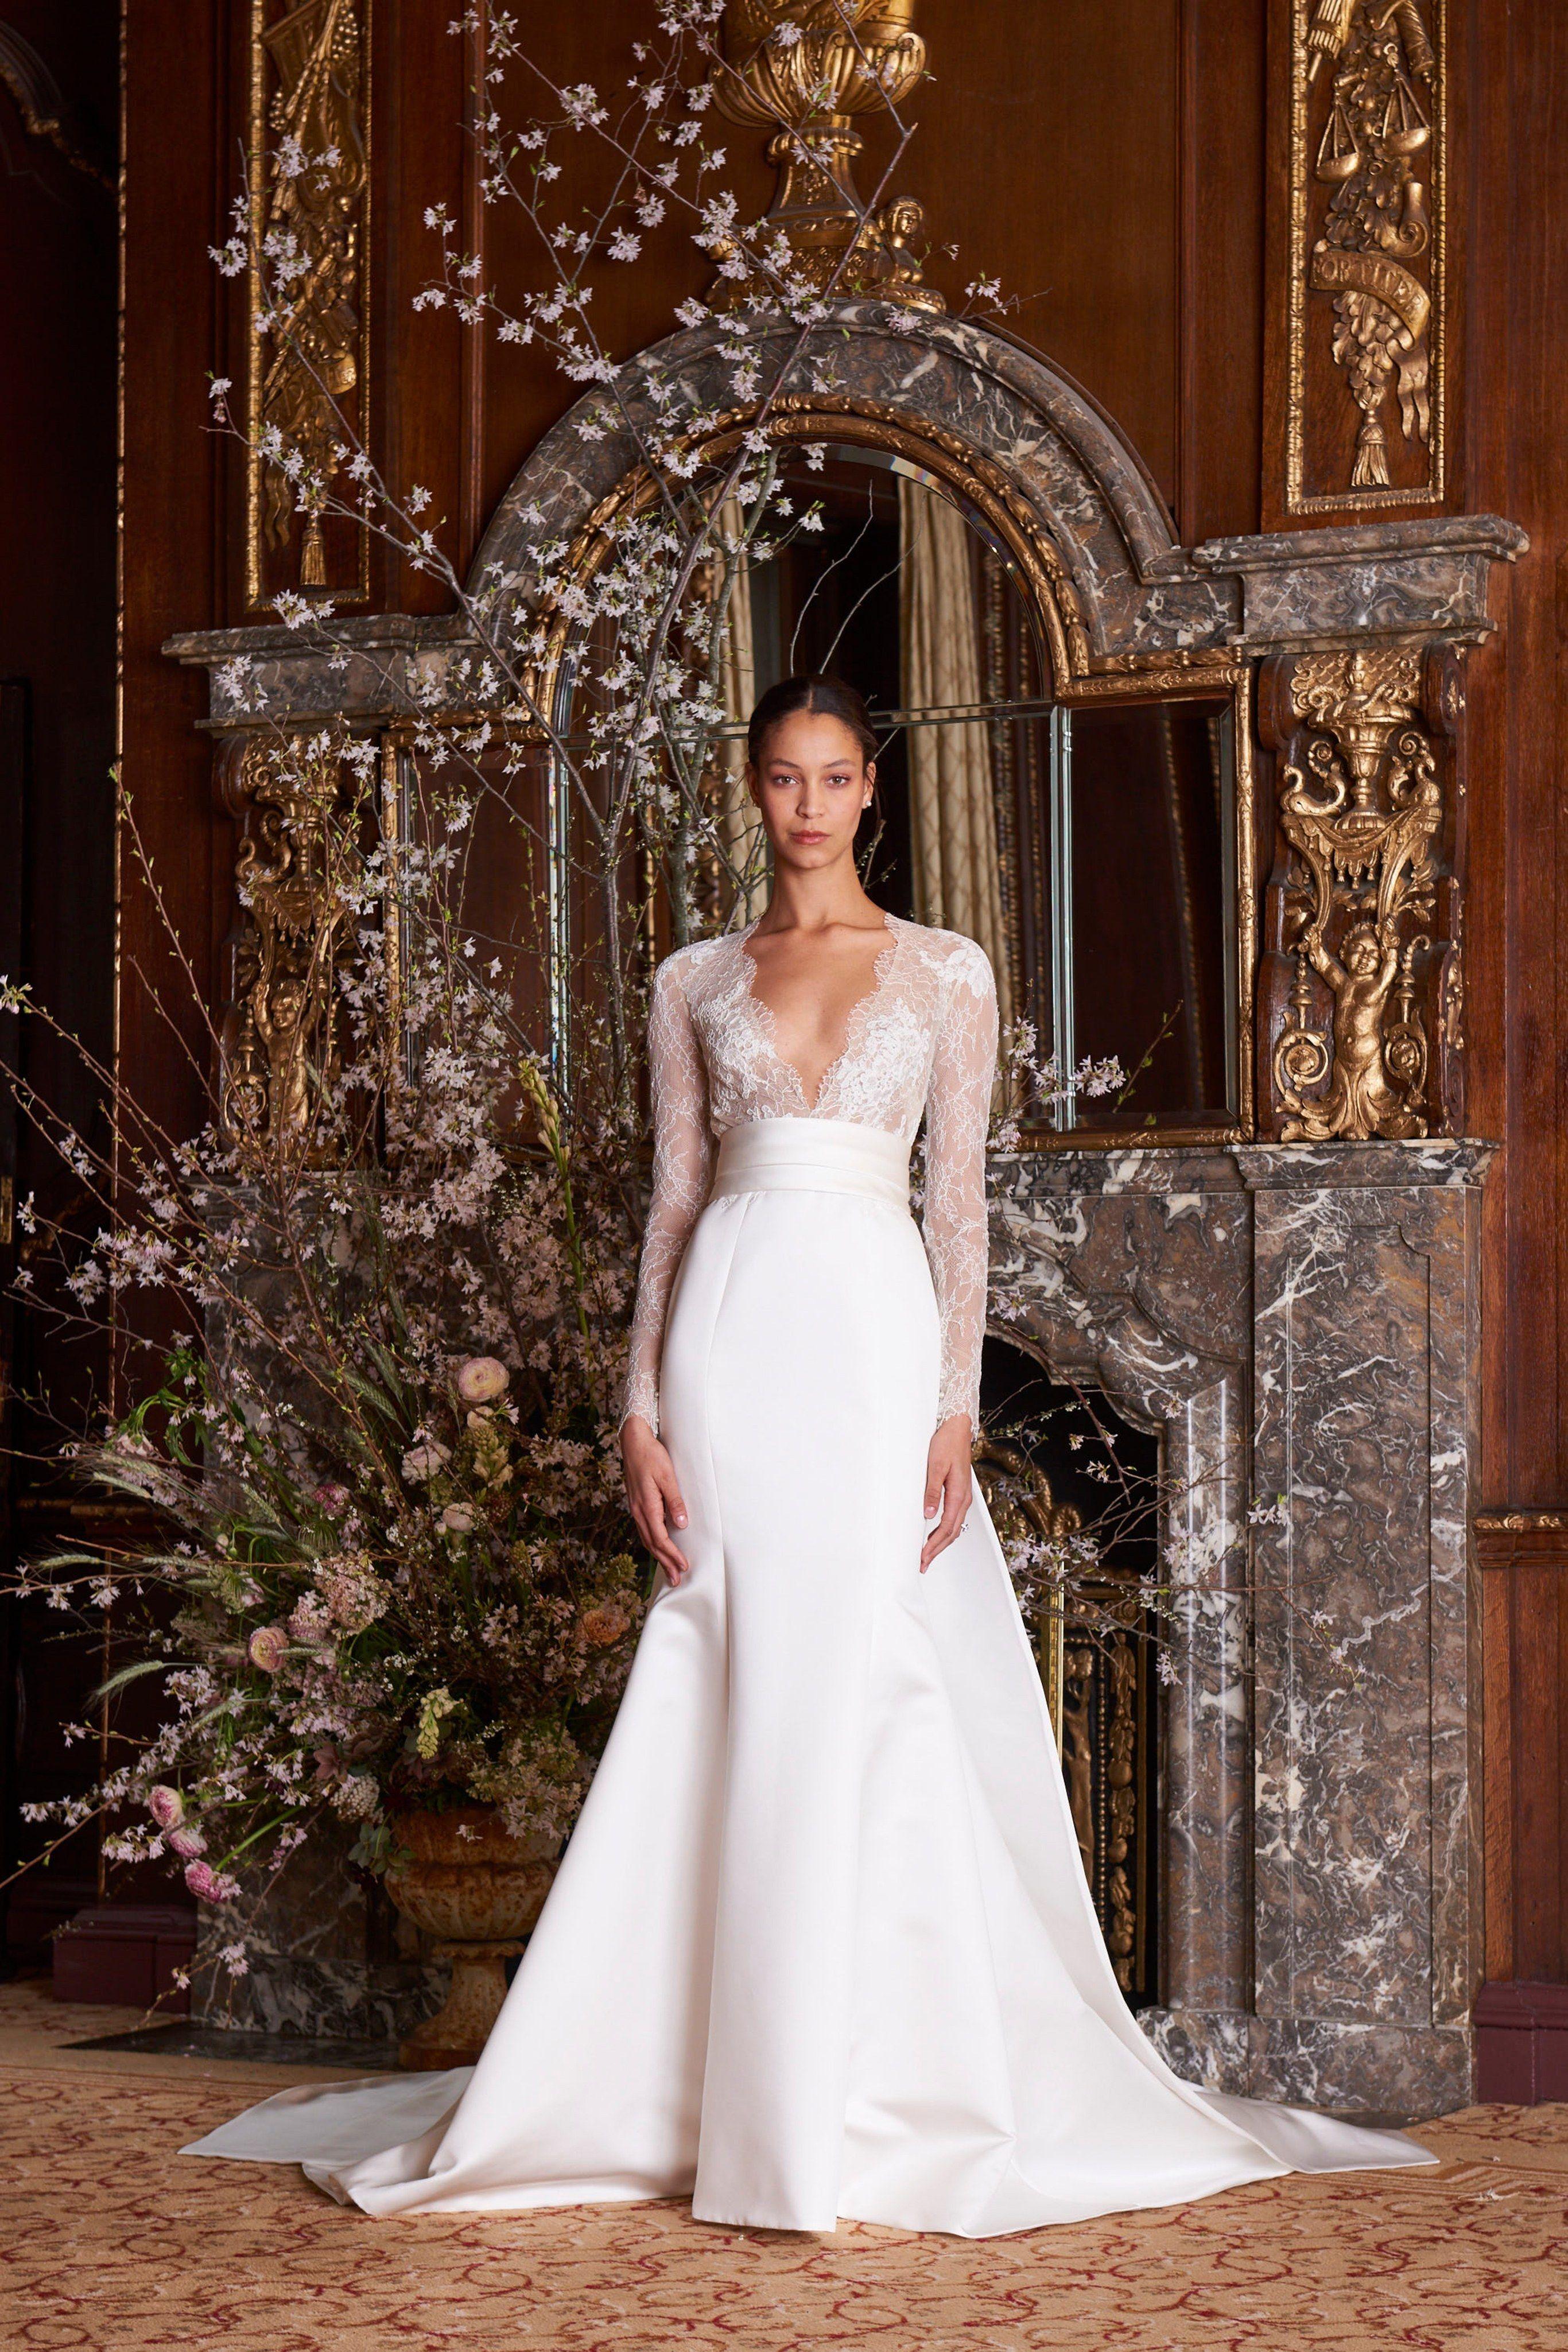 Vestidos de novia monique lhuillier un deleite sohaute art